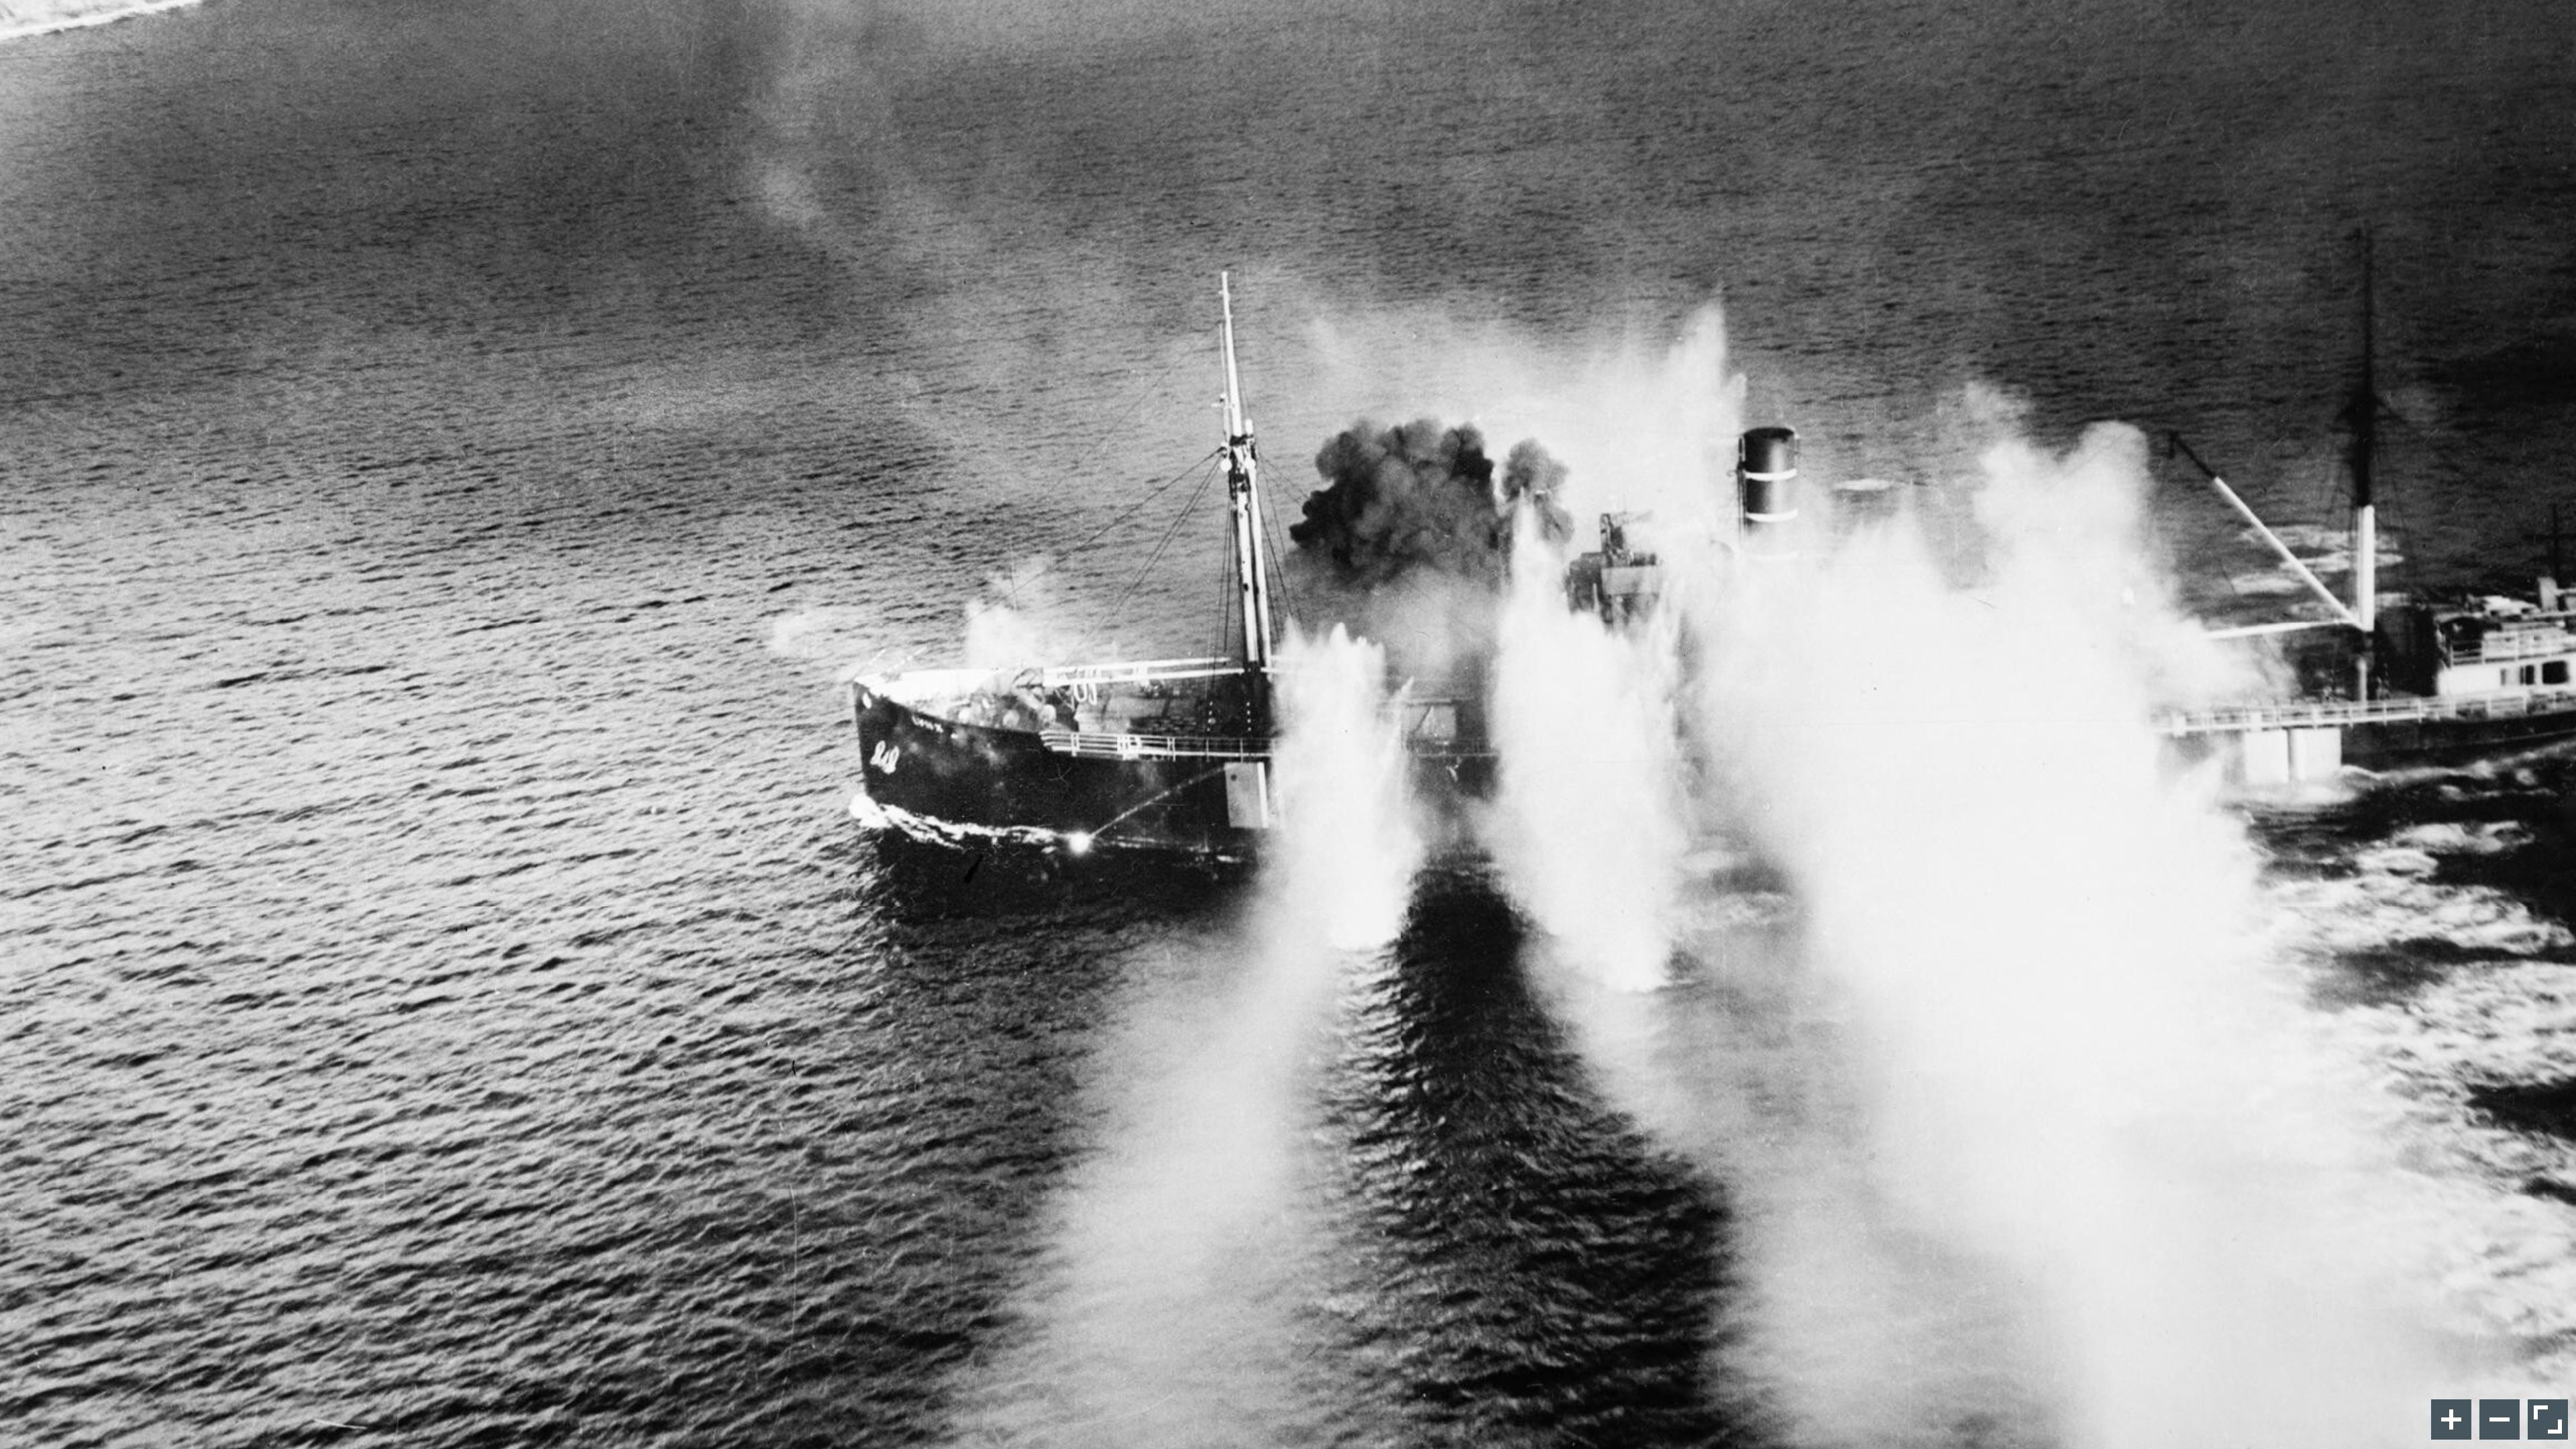 Beaufighter Banff Strike Wing sink 1,367 ton merchant vessel LYNX in Stav Fjord Norway 19 Sep 1944 IWM C4657a